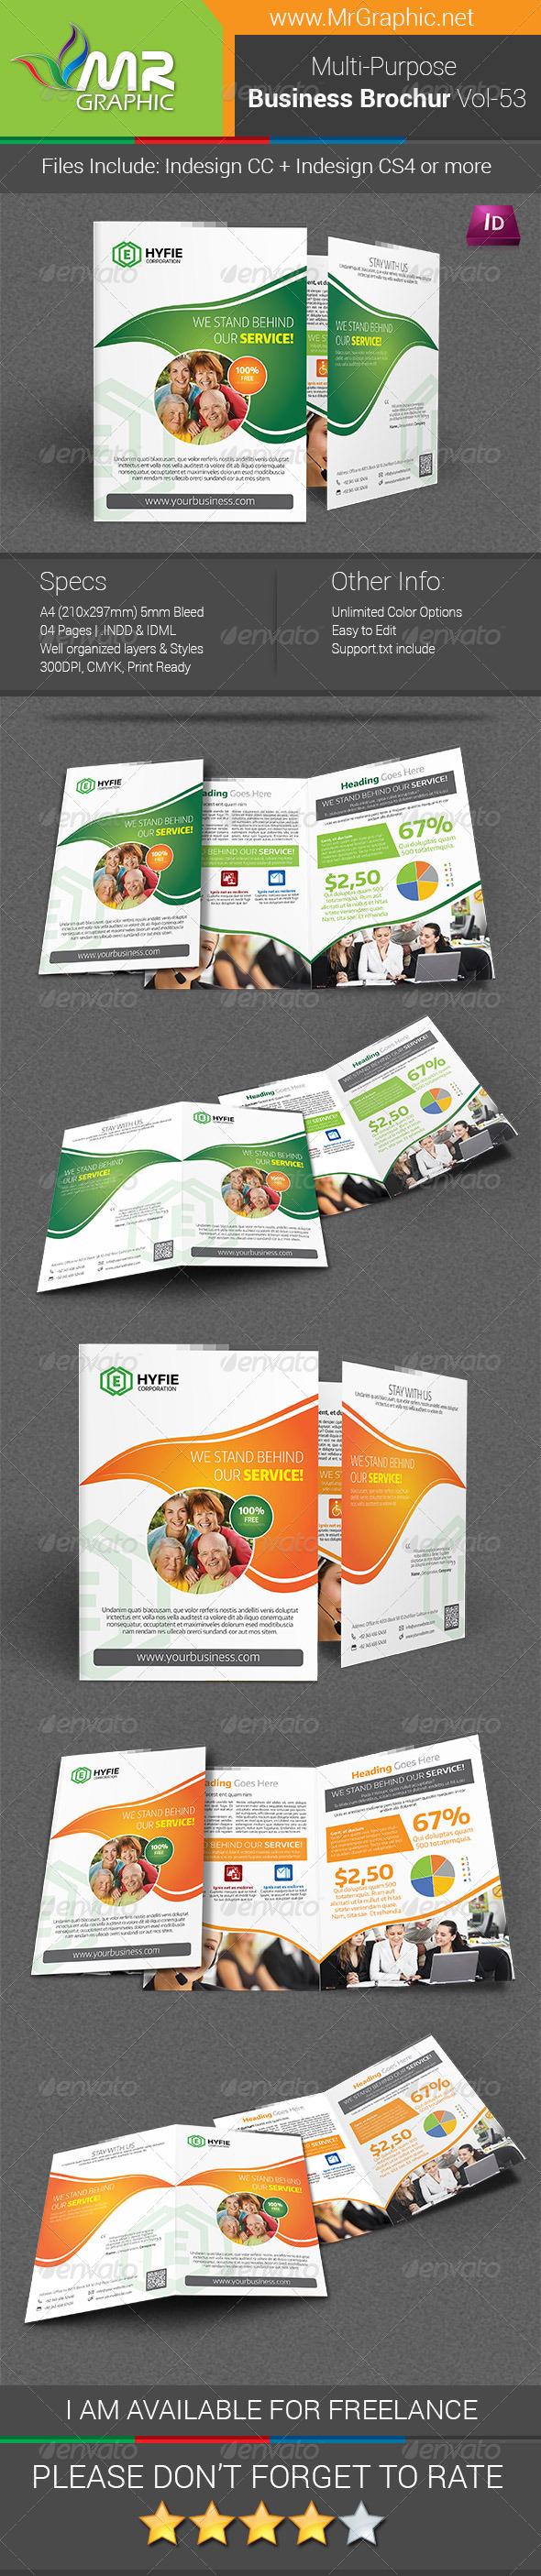 GraphicRiver Multipurpose Business Brochure Template Vol-53 7513028